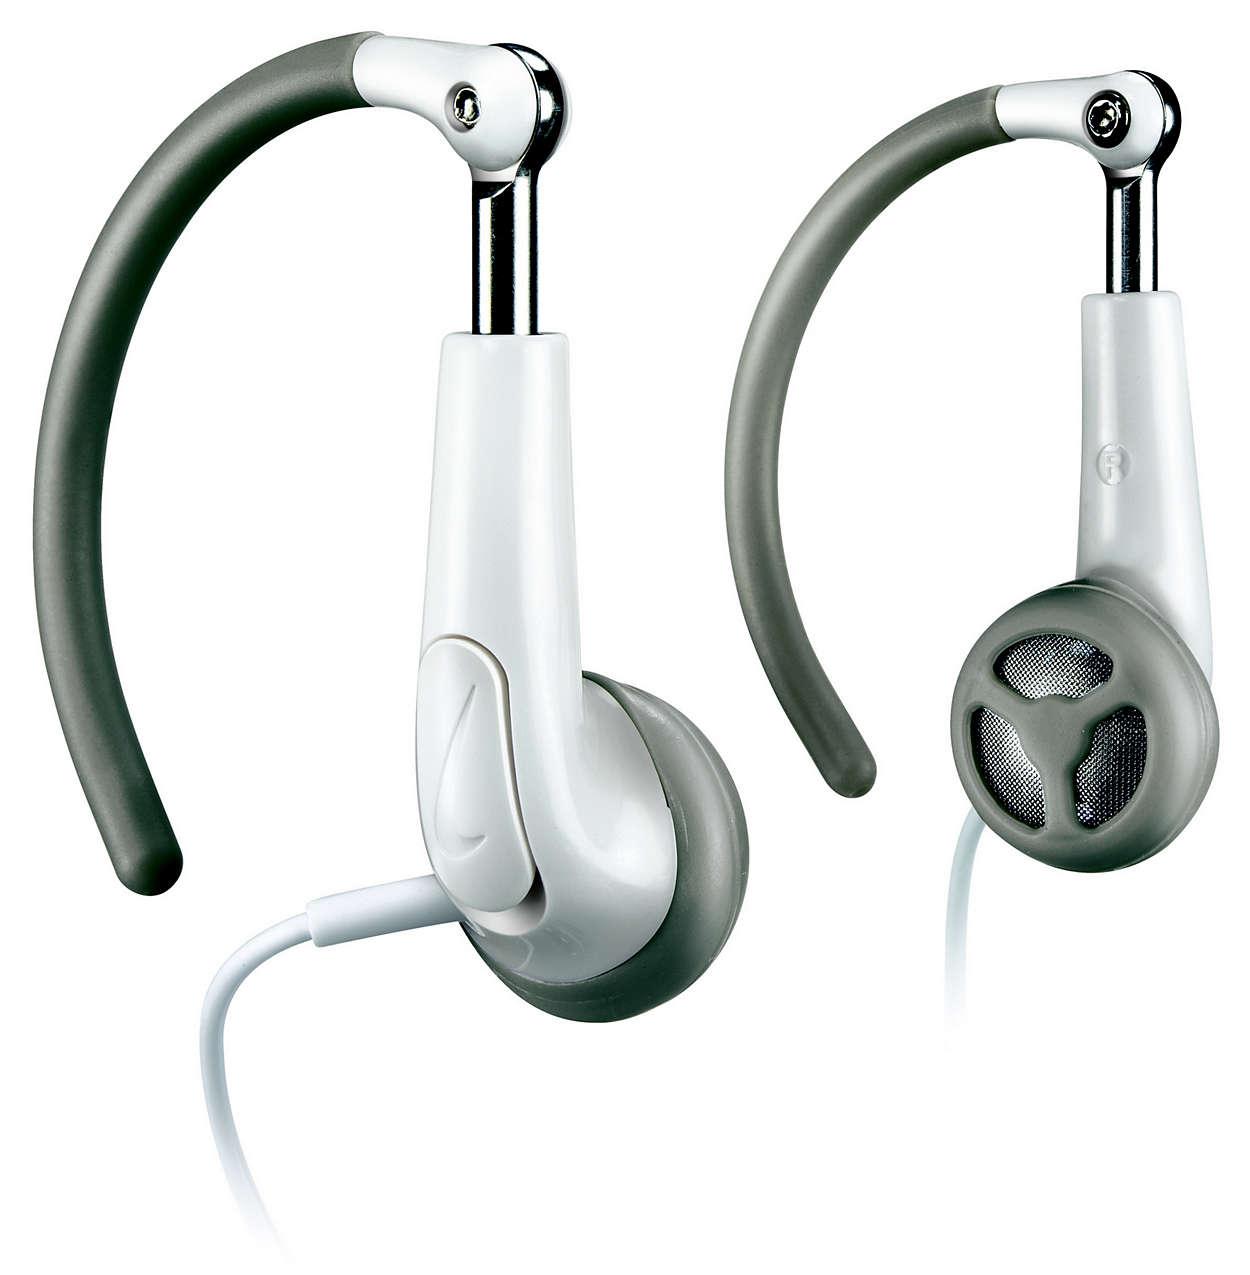 Soporte para oreja totalmente flexible